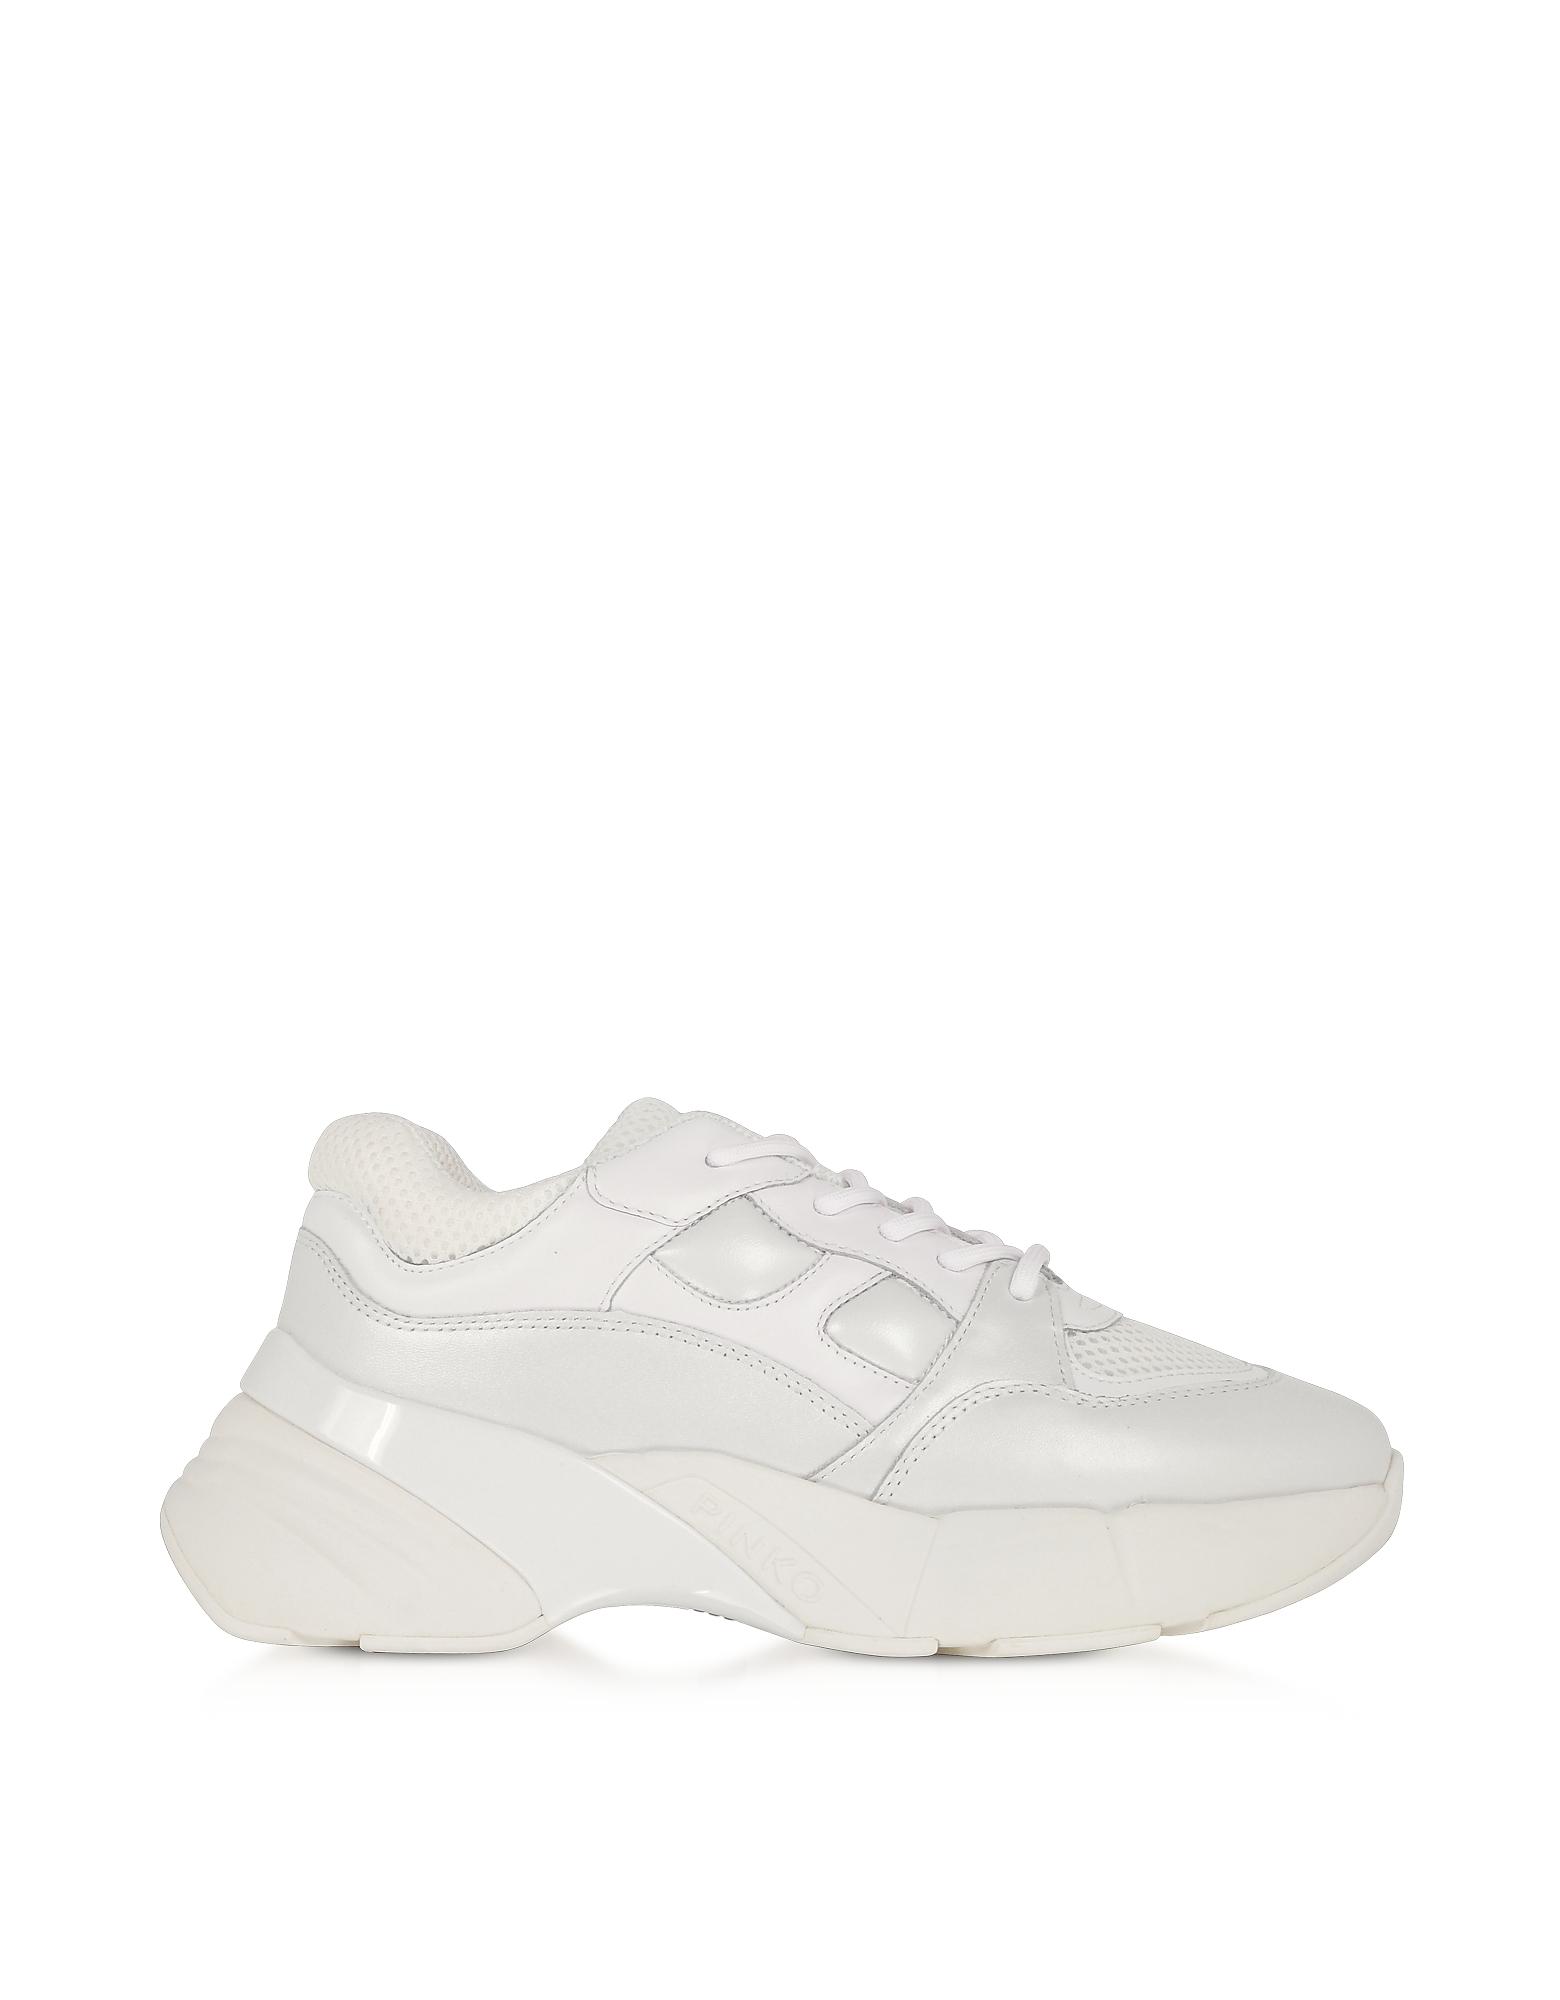 Pinko Designer Shoes, Rubino 2 White Calf Leather Women's Sneakers